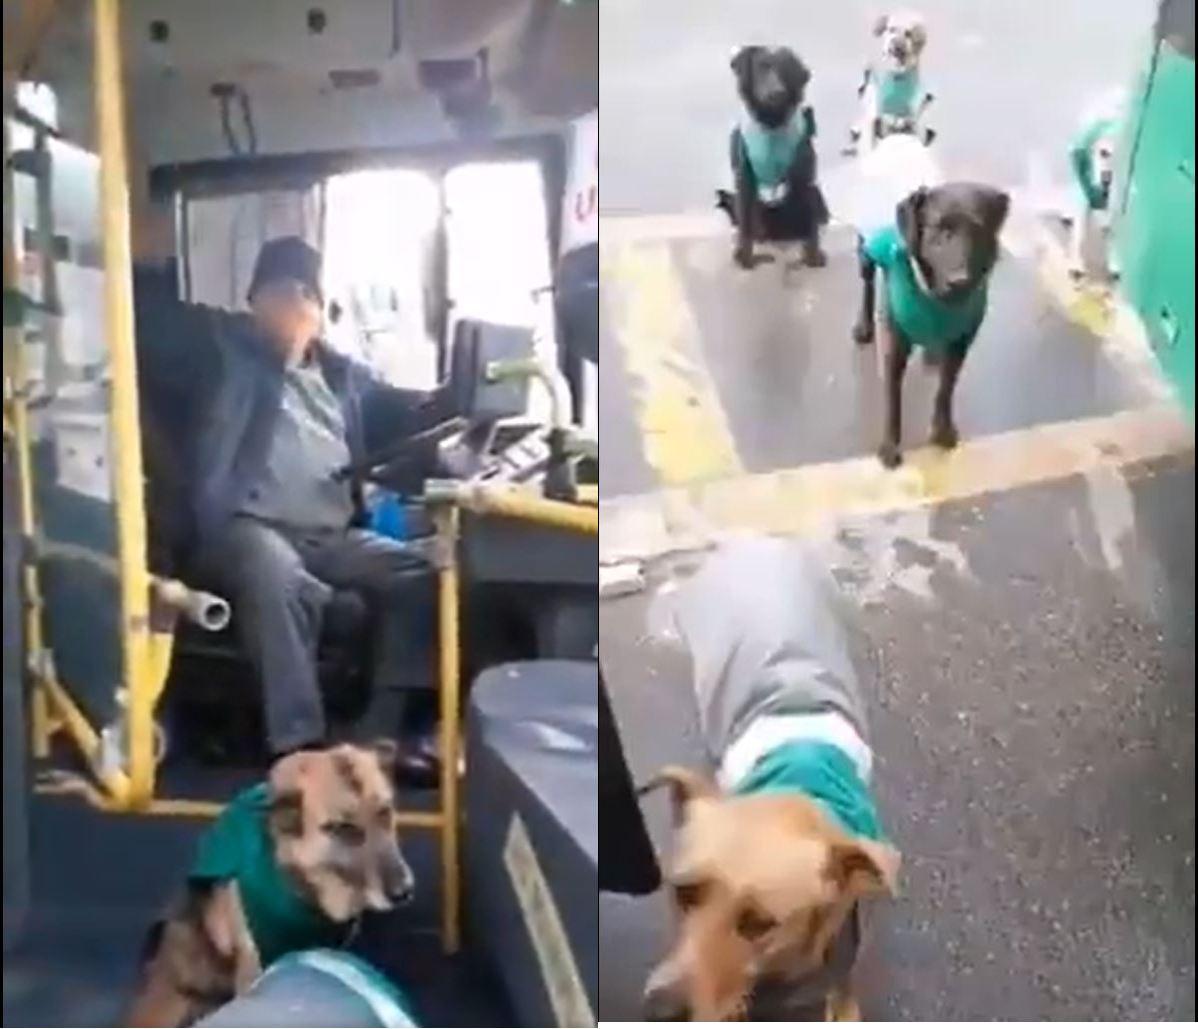 viral-contratan-perritos-callejeros-para-acompanar-a-choferes-en-transporte-publico